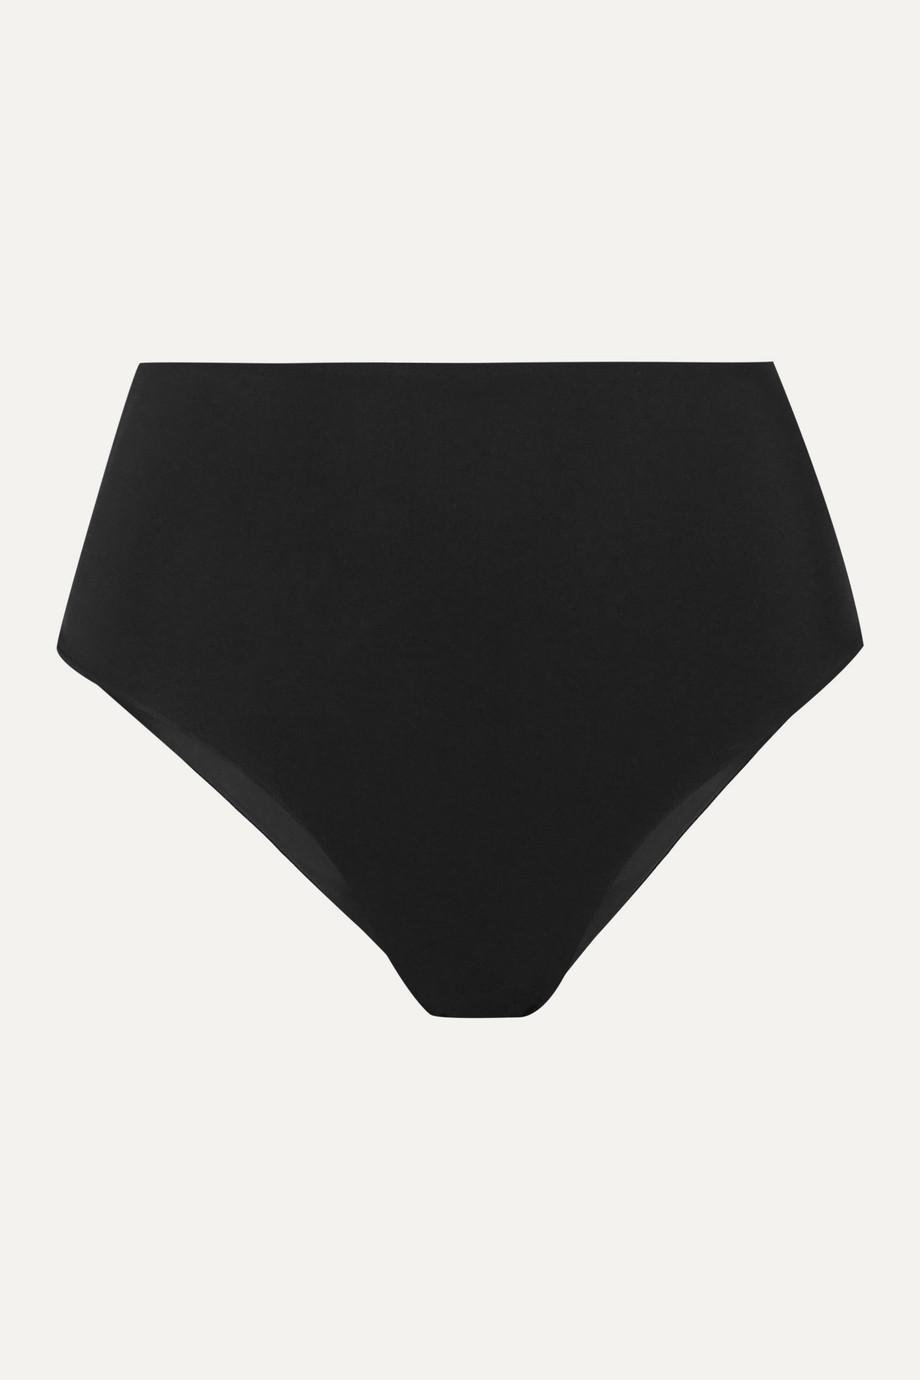 Anemone 比基尼三角裤